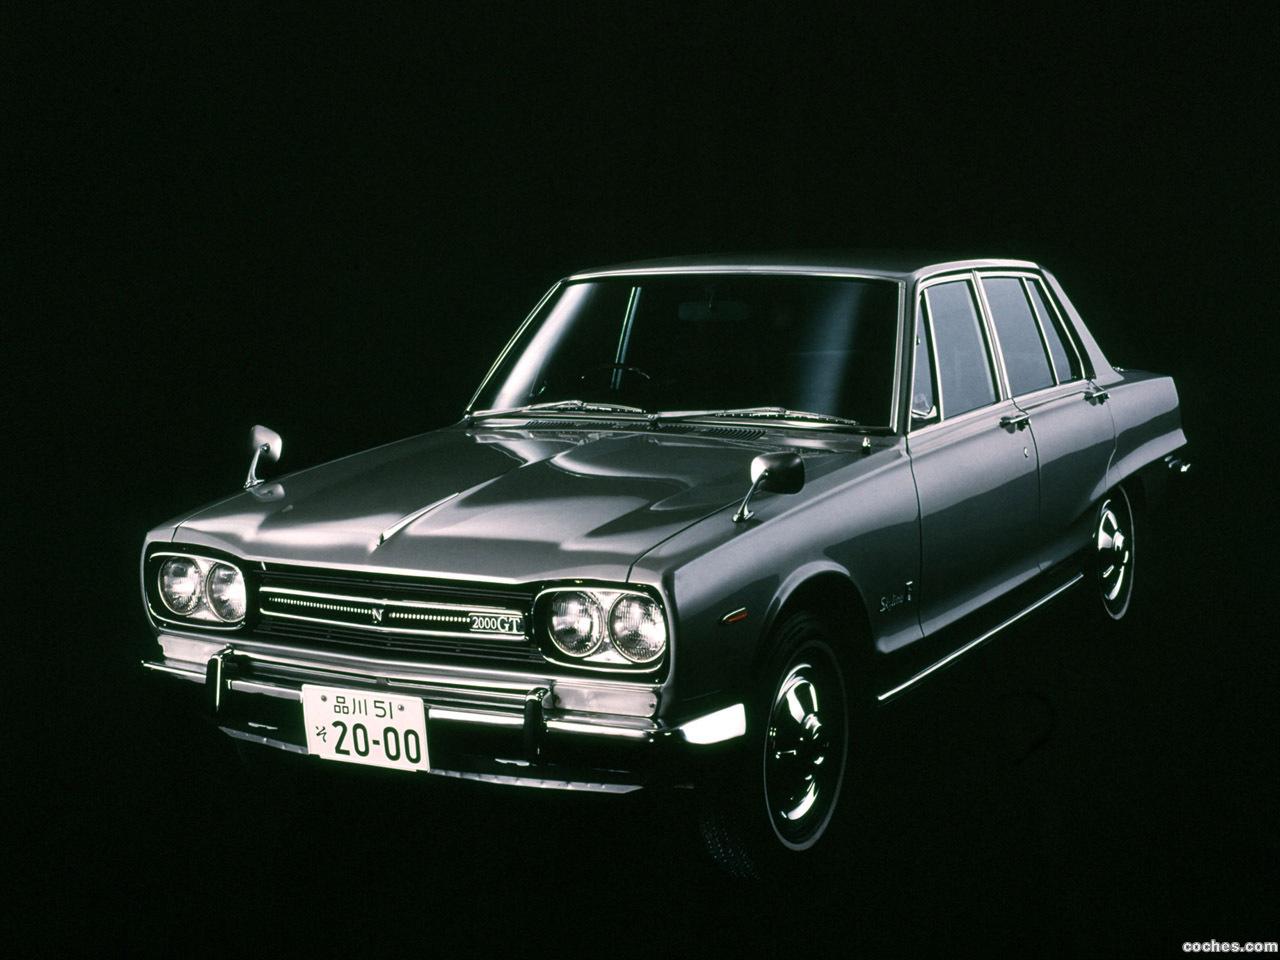 Foto 0 de Nissan Skyline 2000GT C10 1968